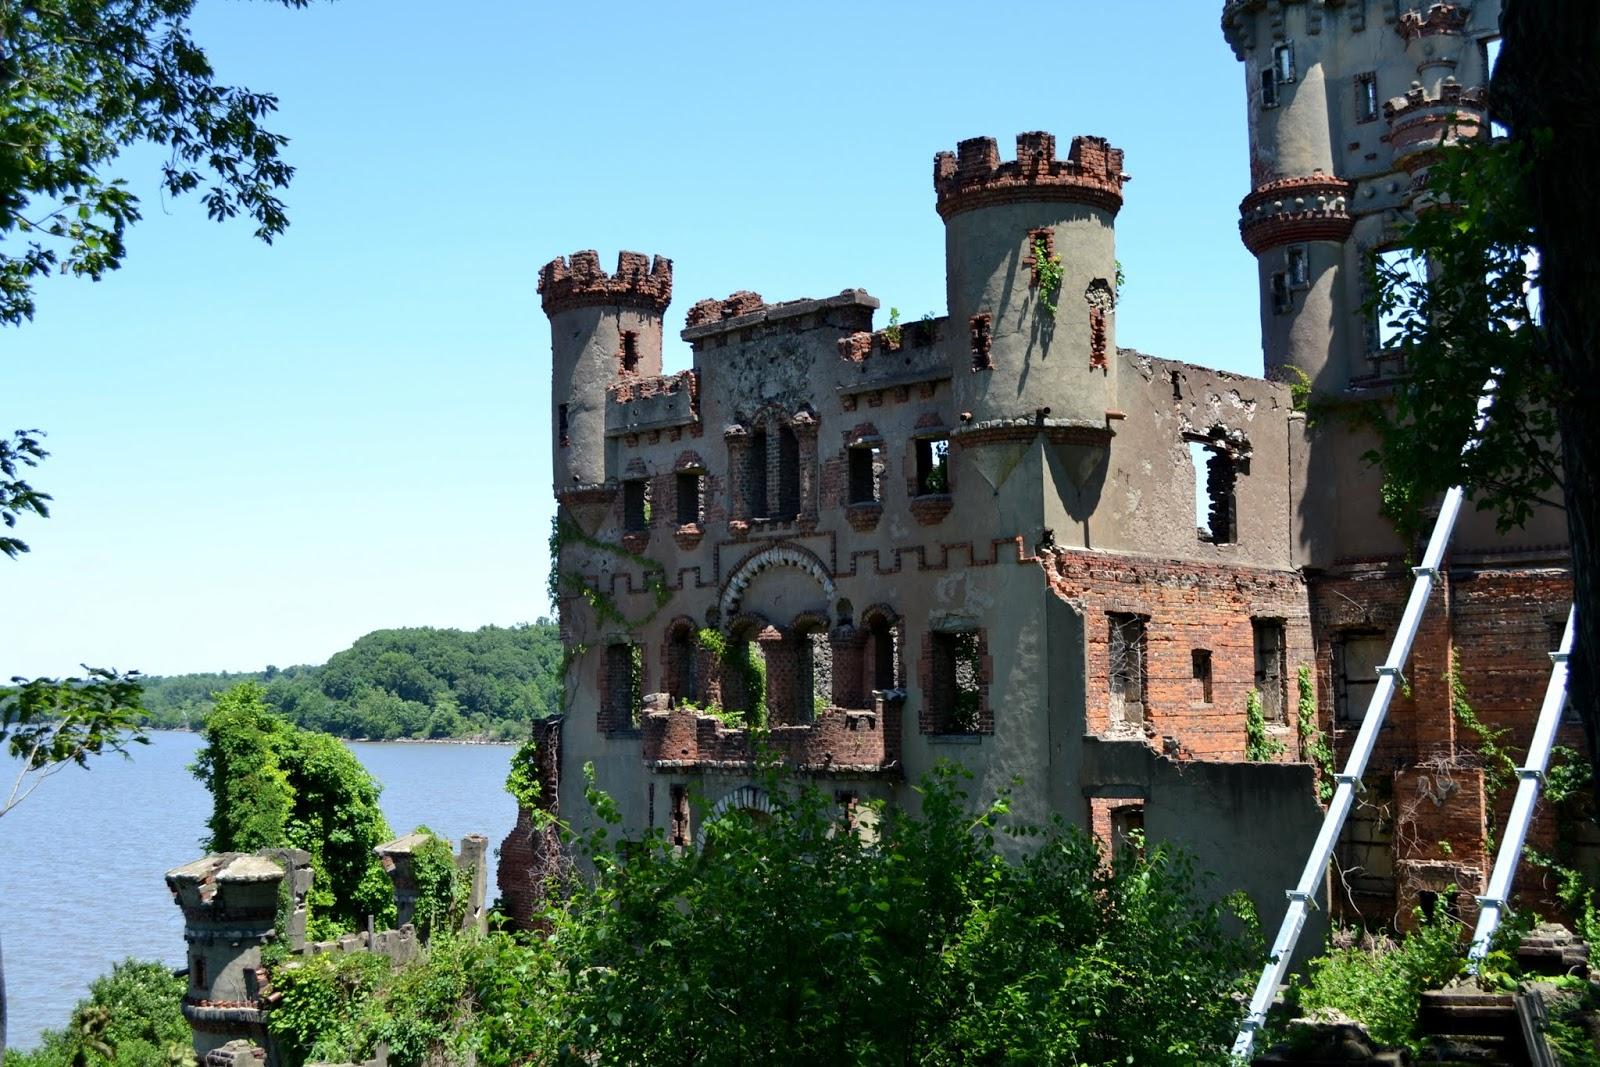 Остров Баннермена, штат Нью-Йорк (Bannerman's Island, NY)